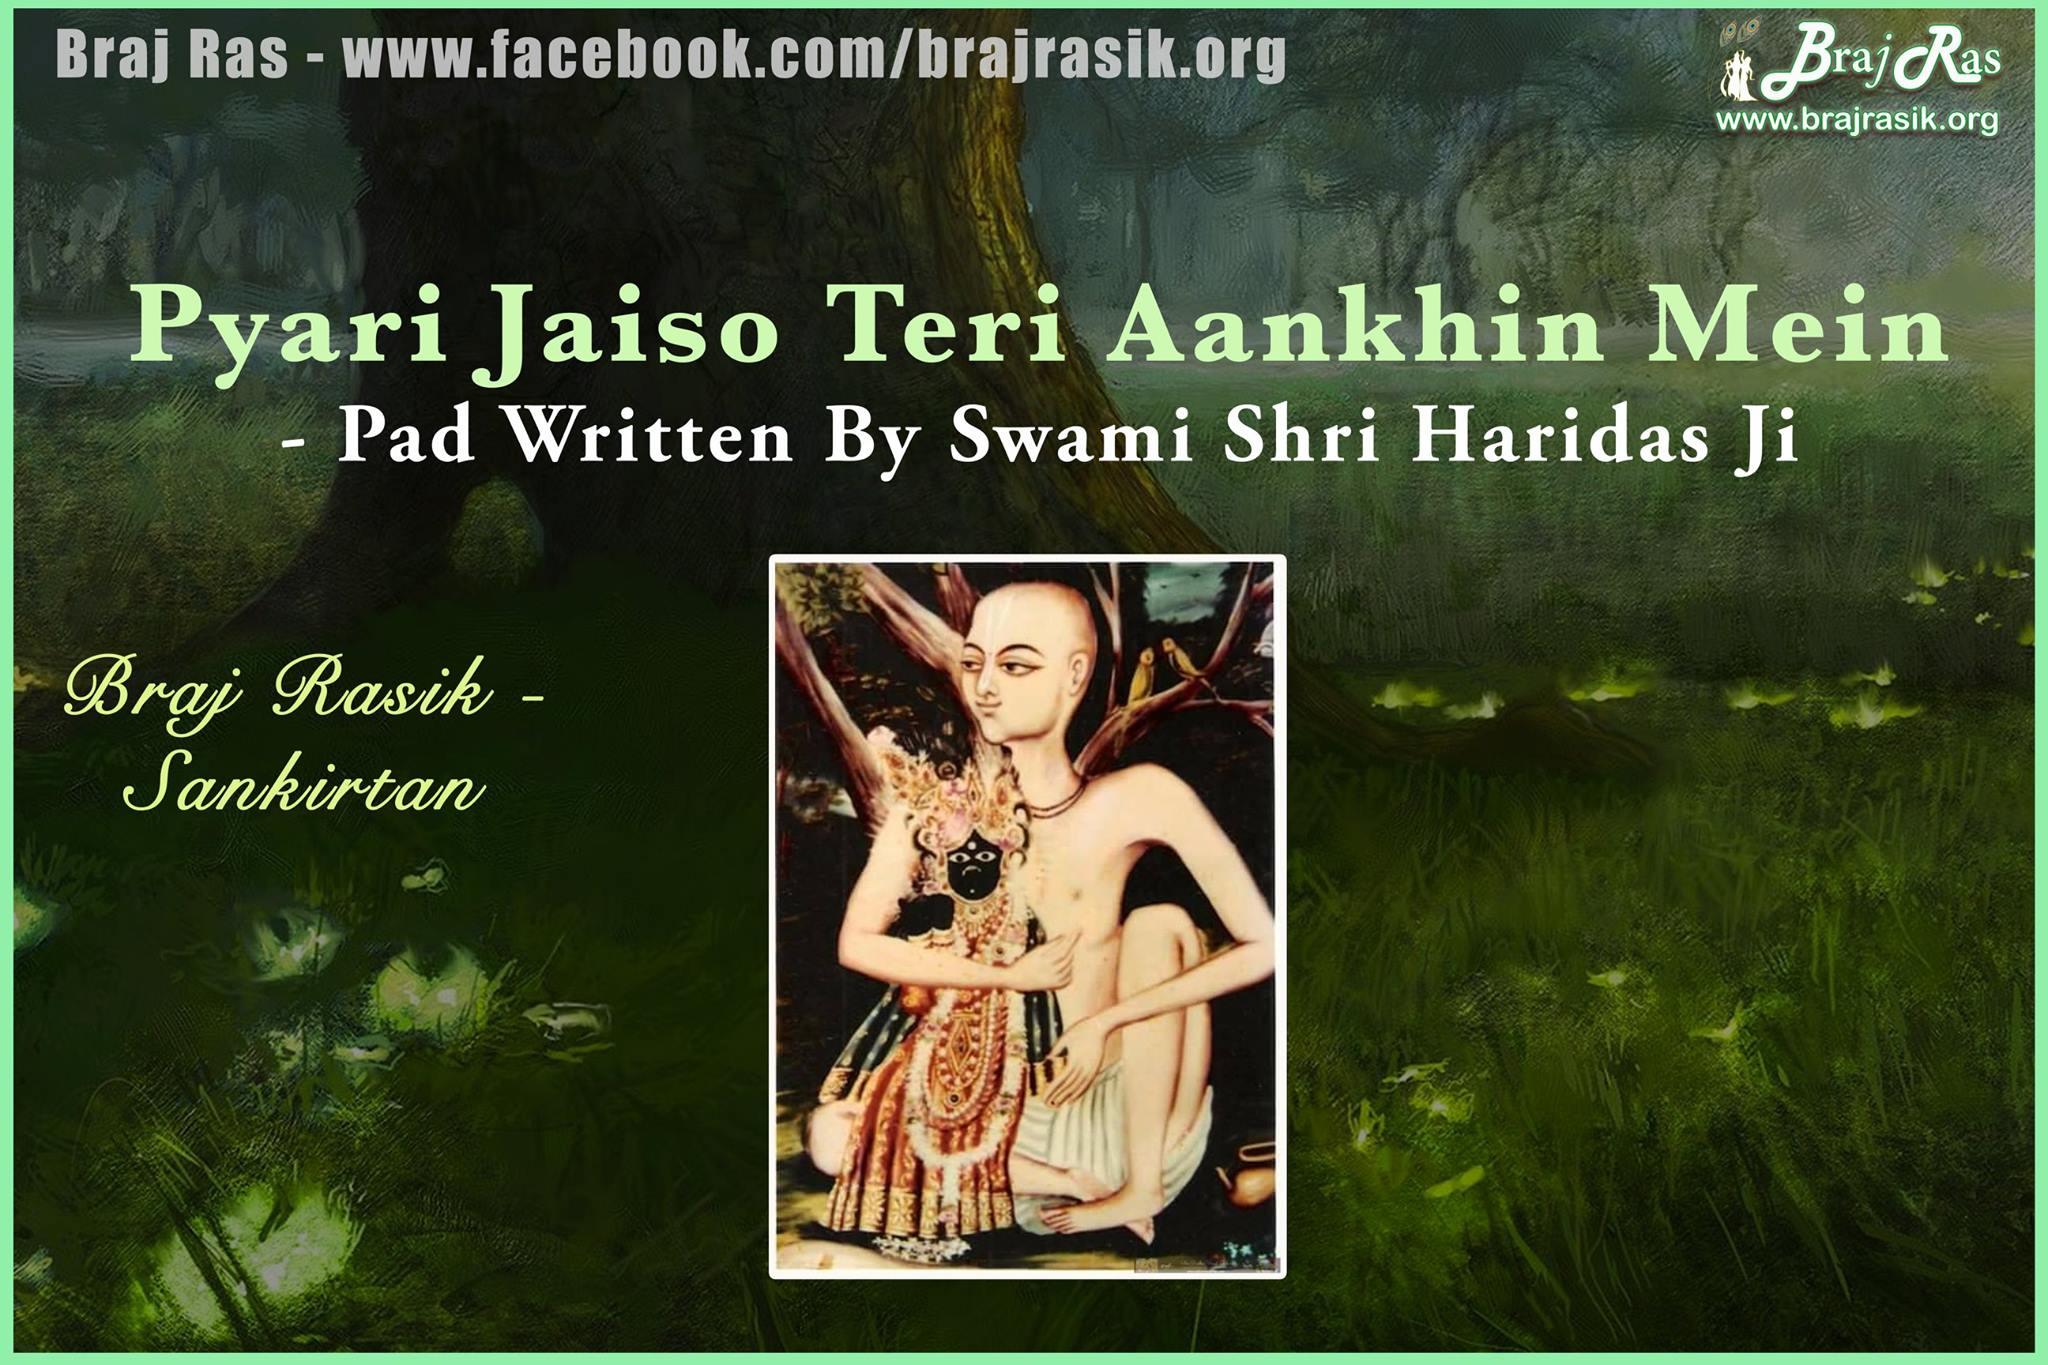 Pyari Jaiso Teri Aankhein Mein - Pad Written By Swami Shri Haridas, Kelimal (6)